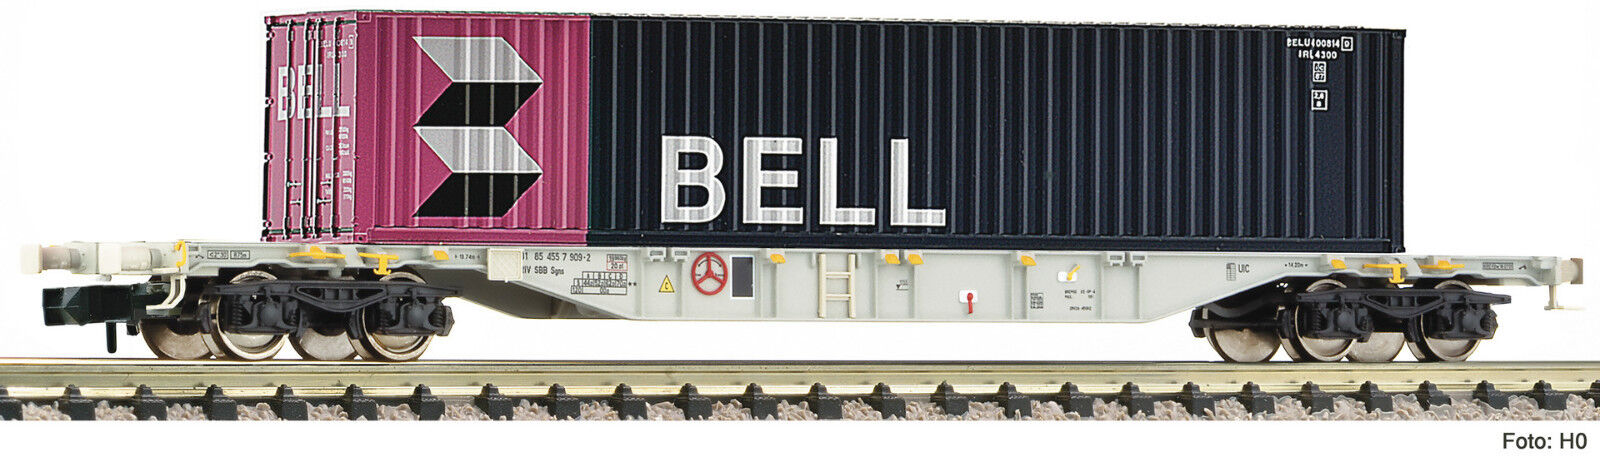 Fleischmann n 825208 contenedores Cochero SBB Bell contenedores época V nuevo embalaje original